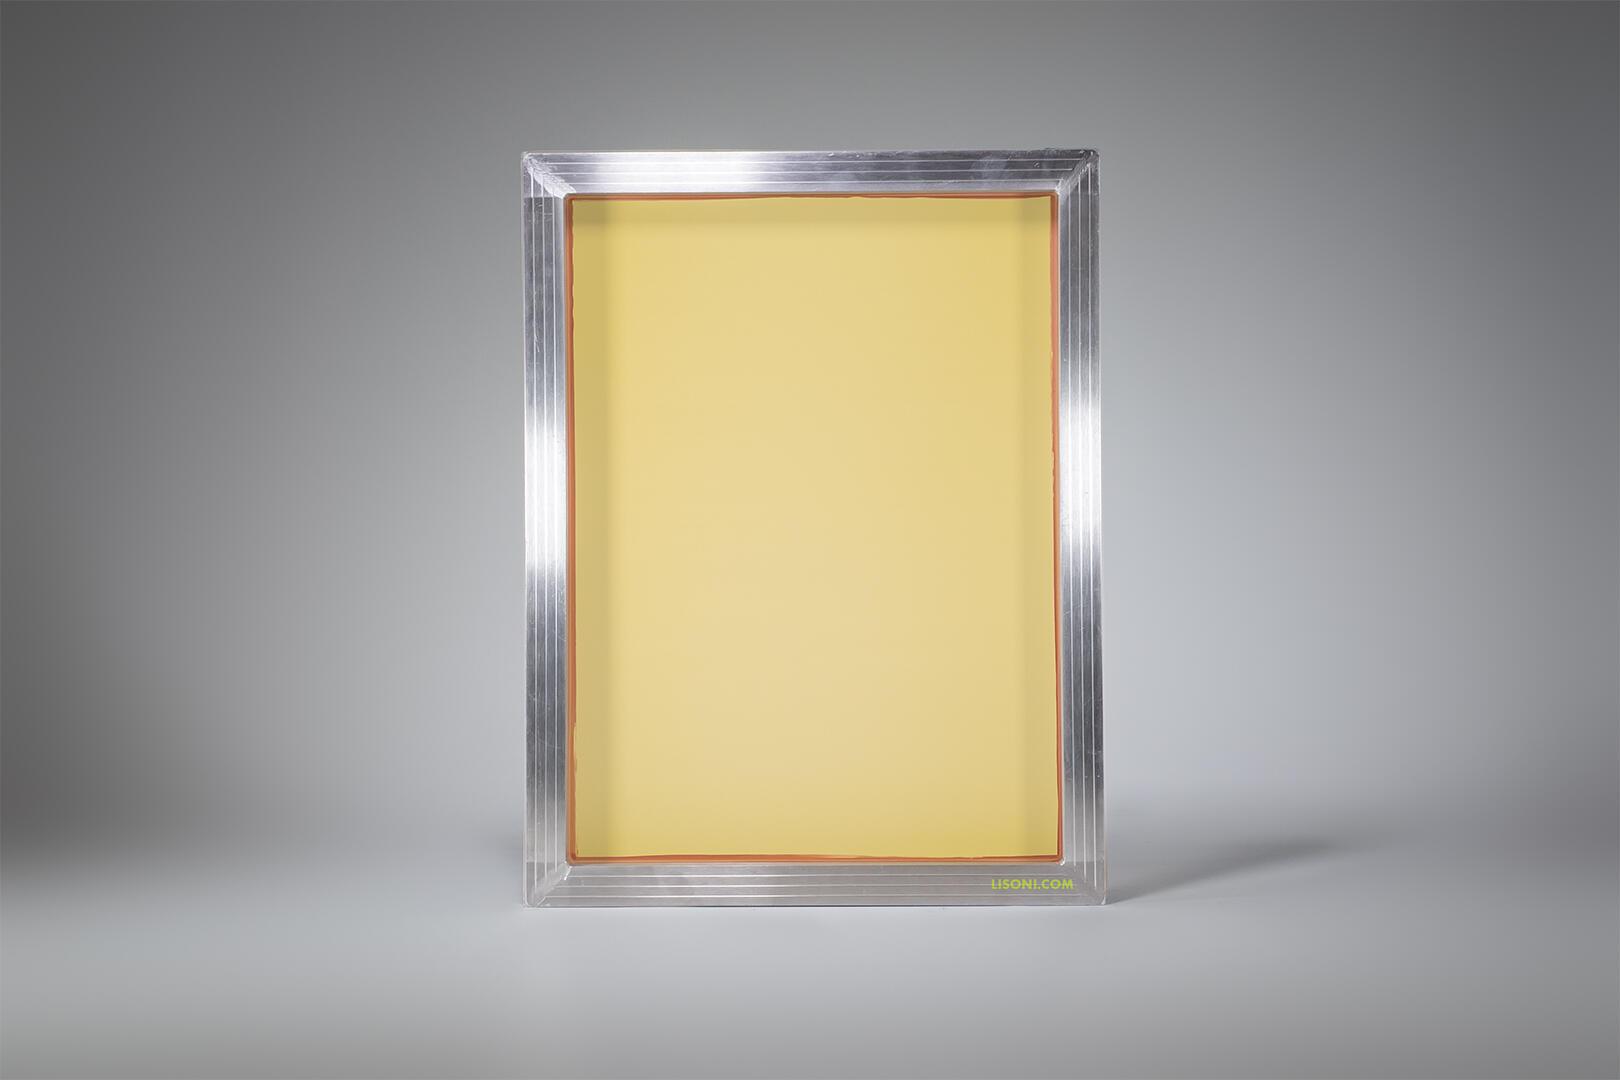 Siebdruckrahmen DIN A2Aluminium 100T 73x53cm